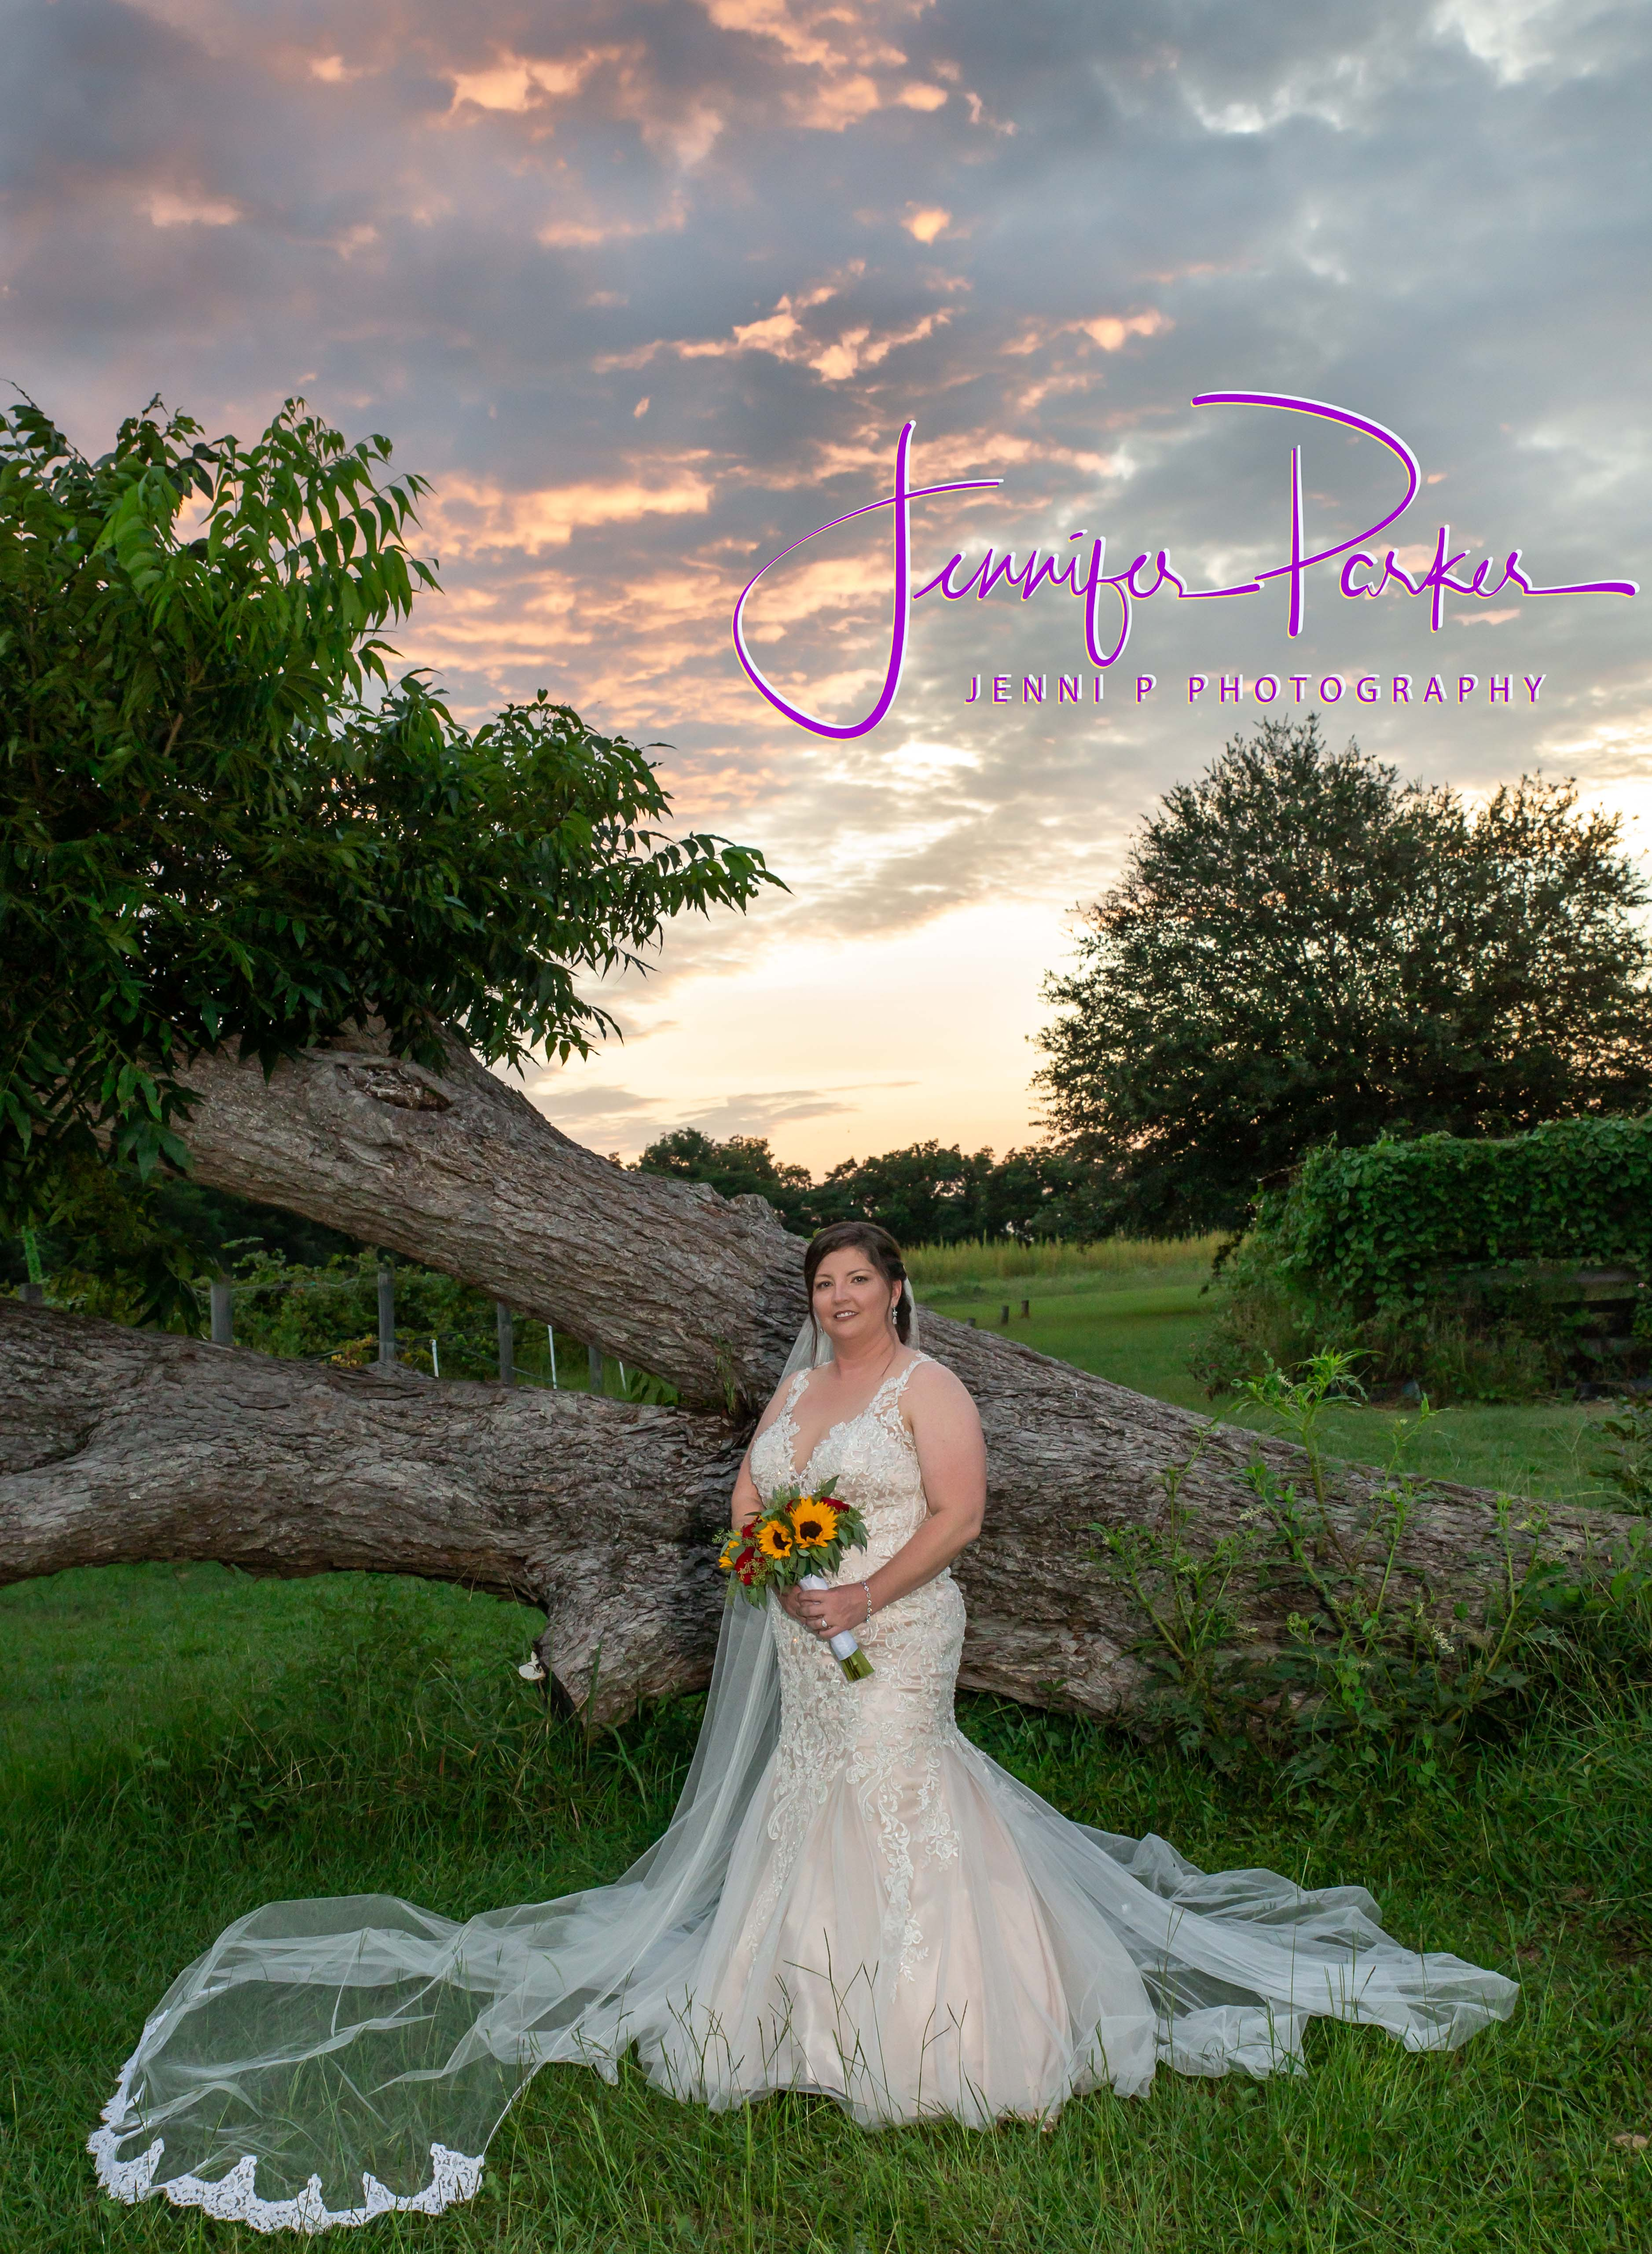 Jennipphotography.com-166